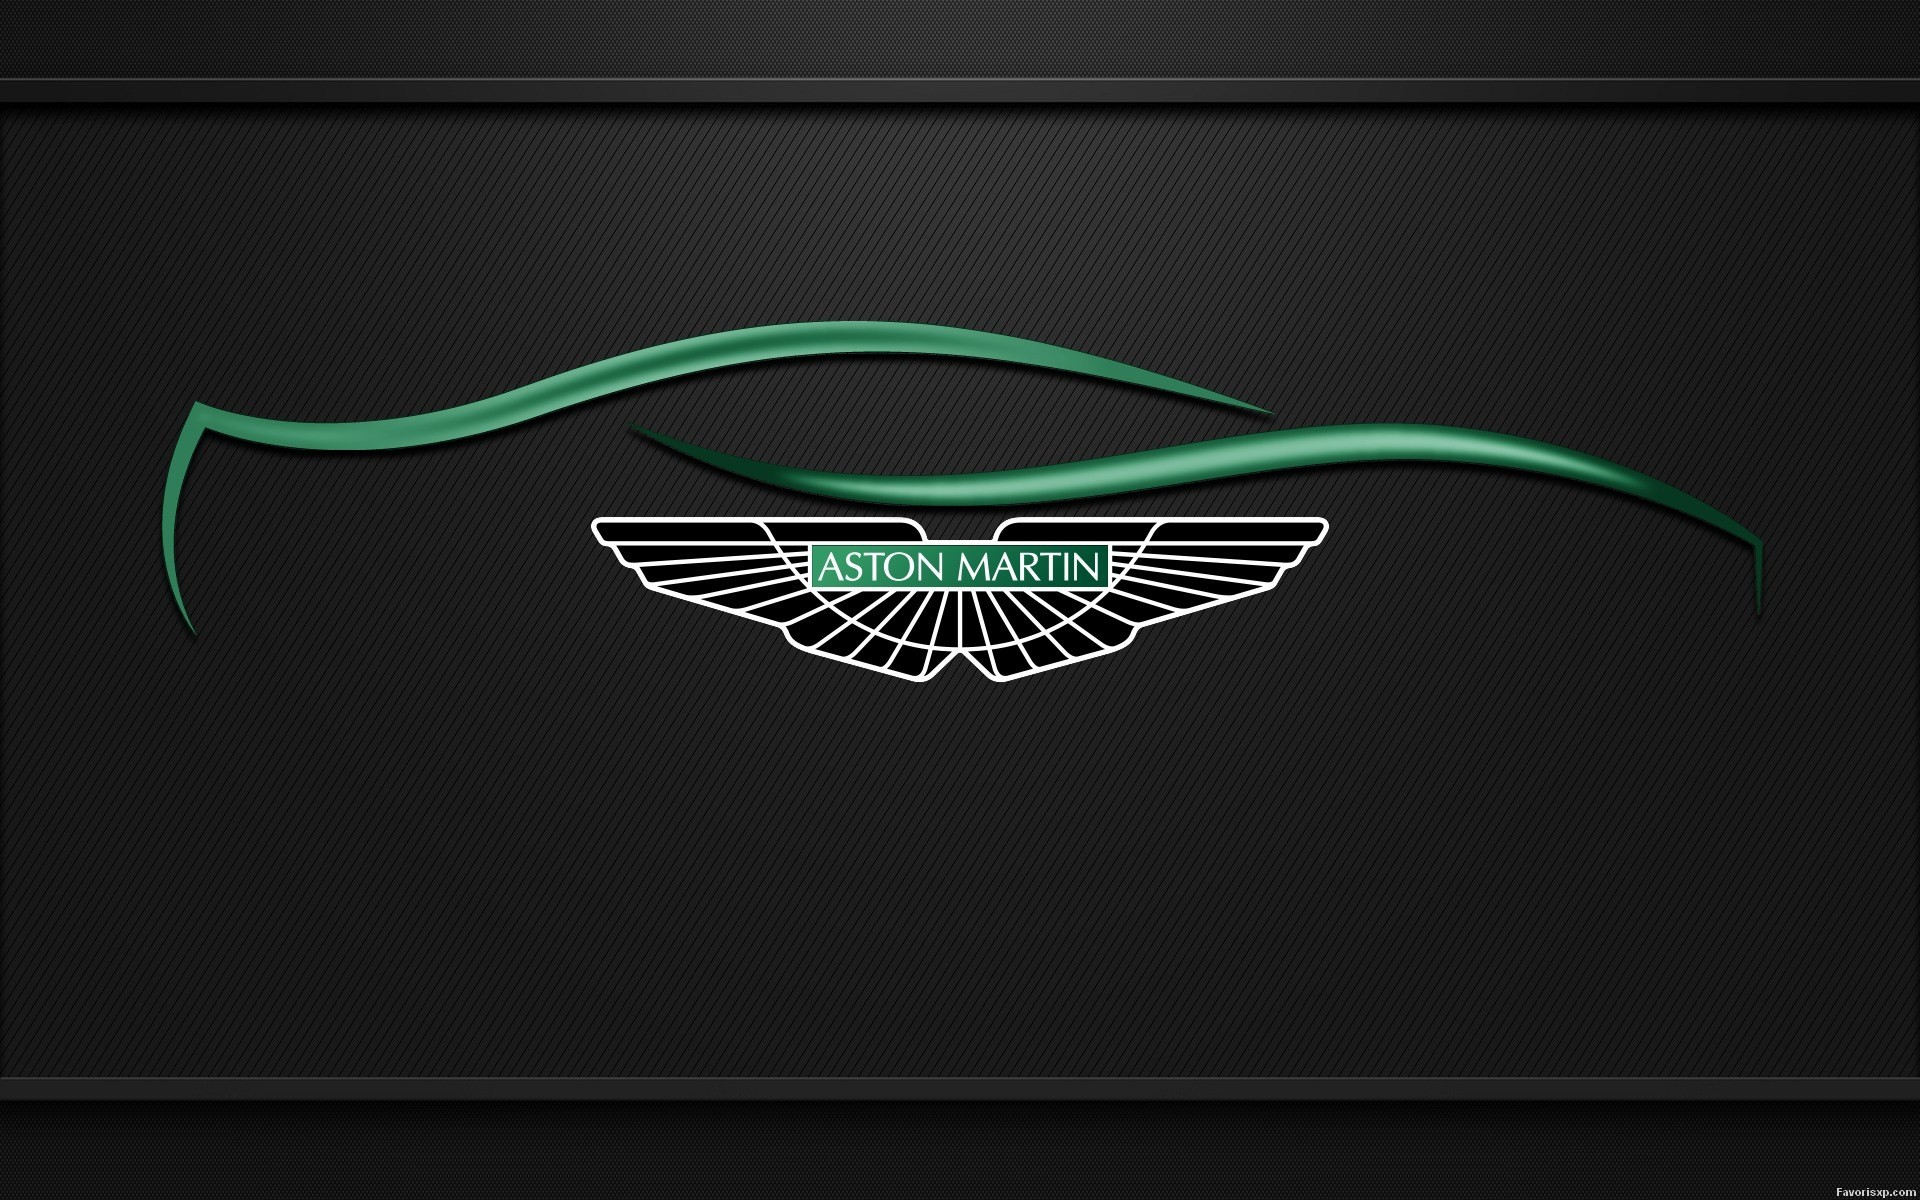 Iphone X Wallpaper Hd Black Aston Martin Logo Wallpapers 55 Images